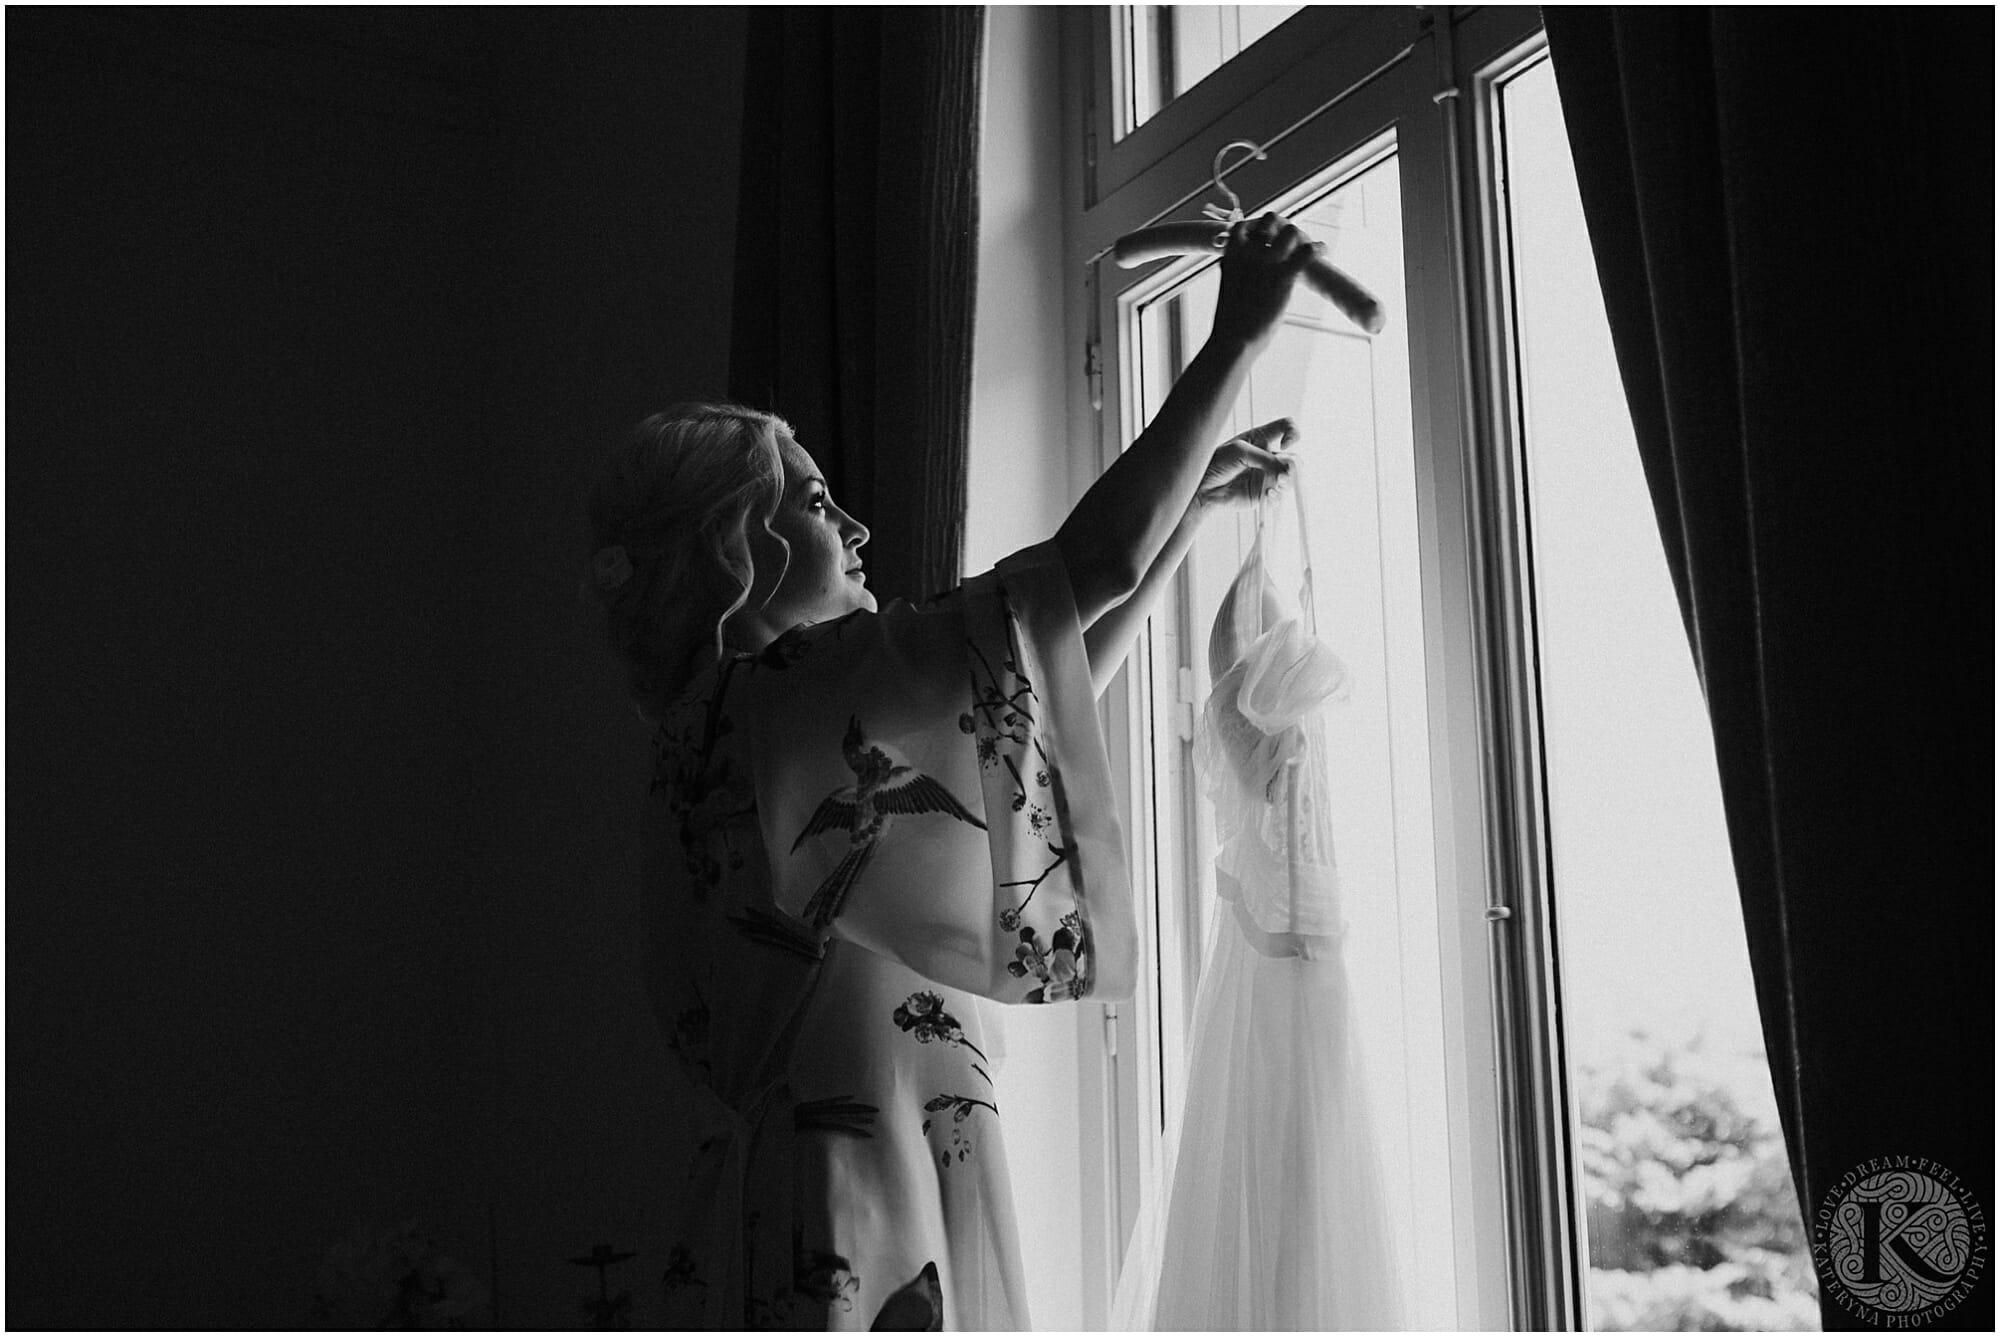 Kateryna-photos-photographe-mariage-chateau-des-3-fontaines-provence-avignon-vaucluse-sud_0018.jpg